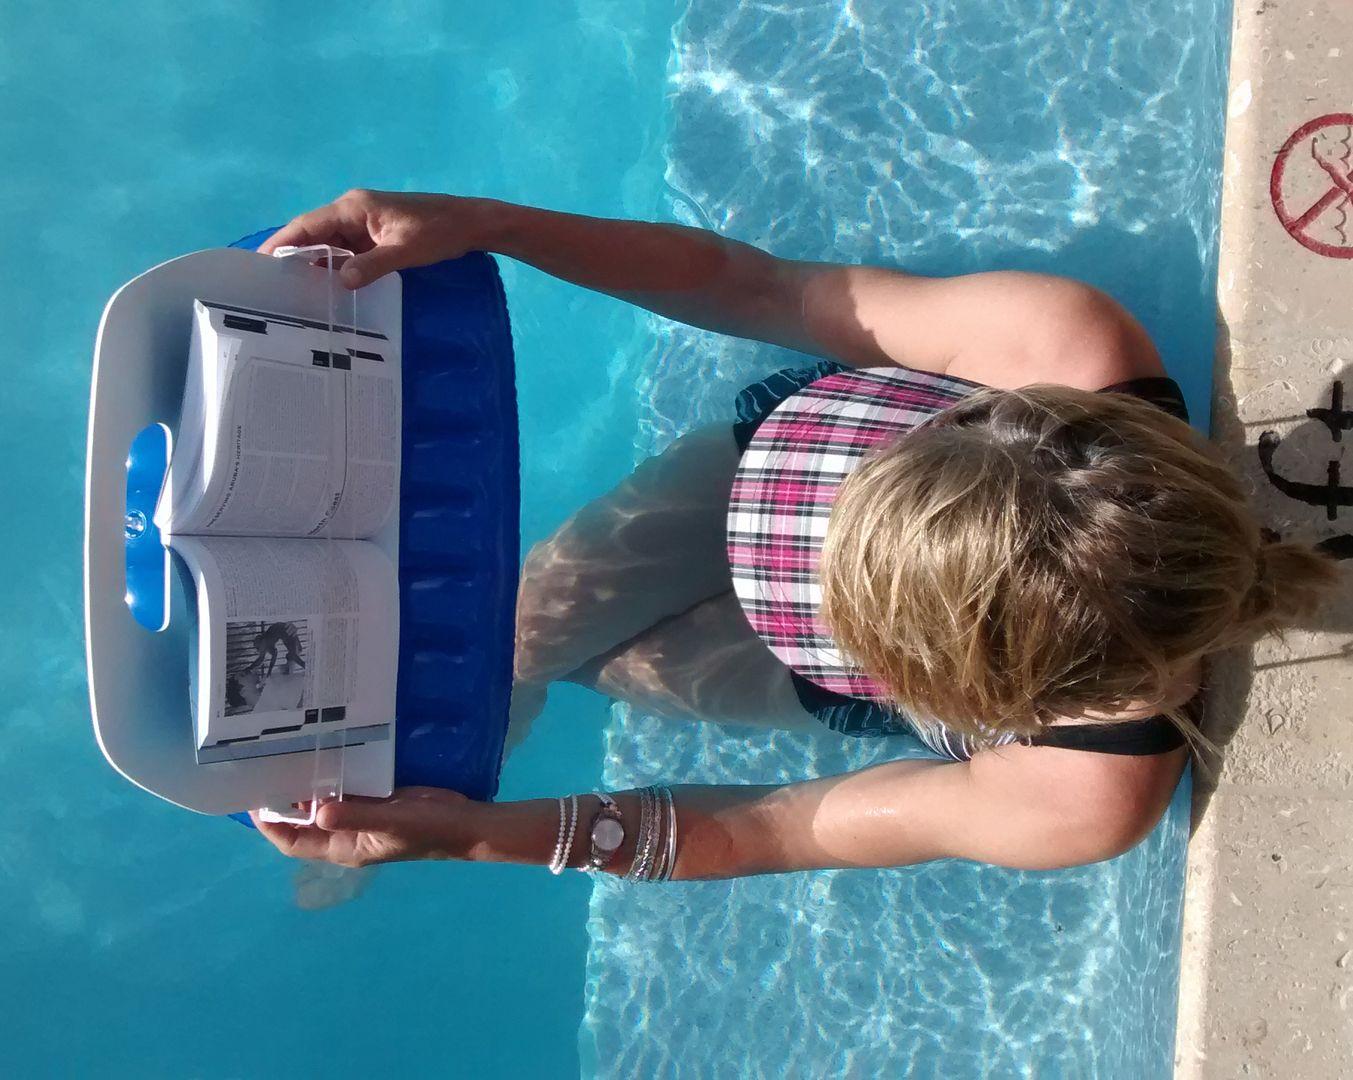 Aquareader bath pool and hot tub reading caddy book